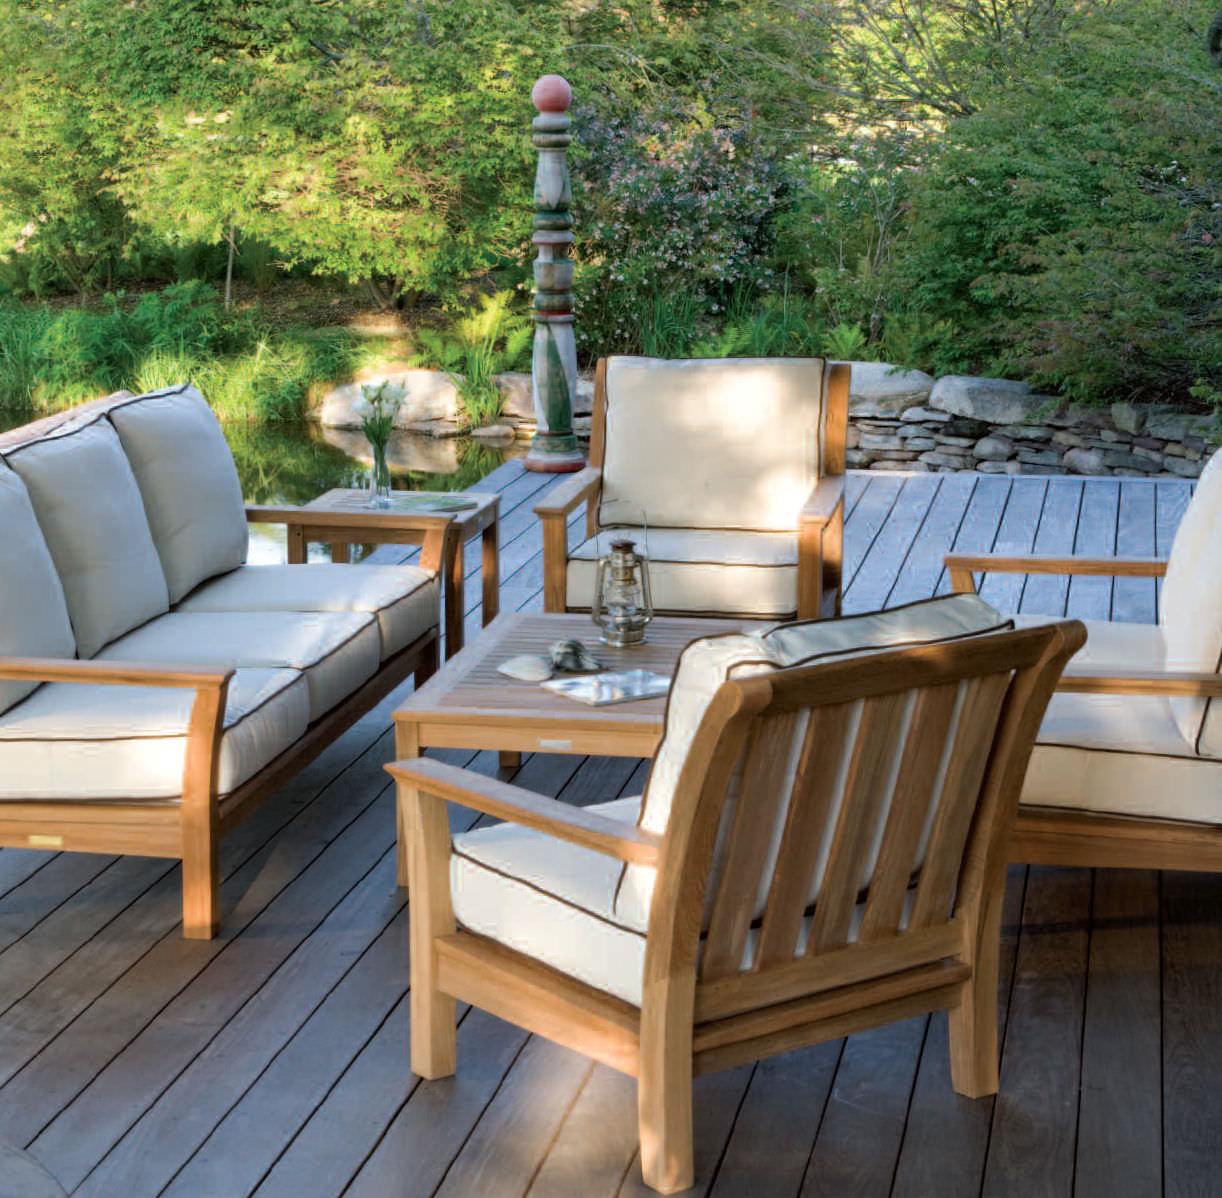 Lounge sofa garten holz  Modernes Sofa / für den Garten / Holz / 3 Plätze - CHELSEA ...